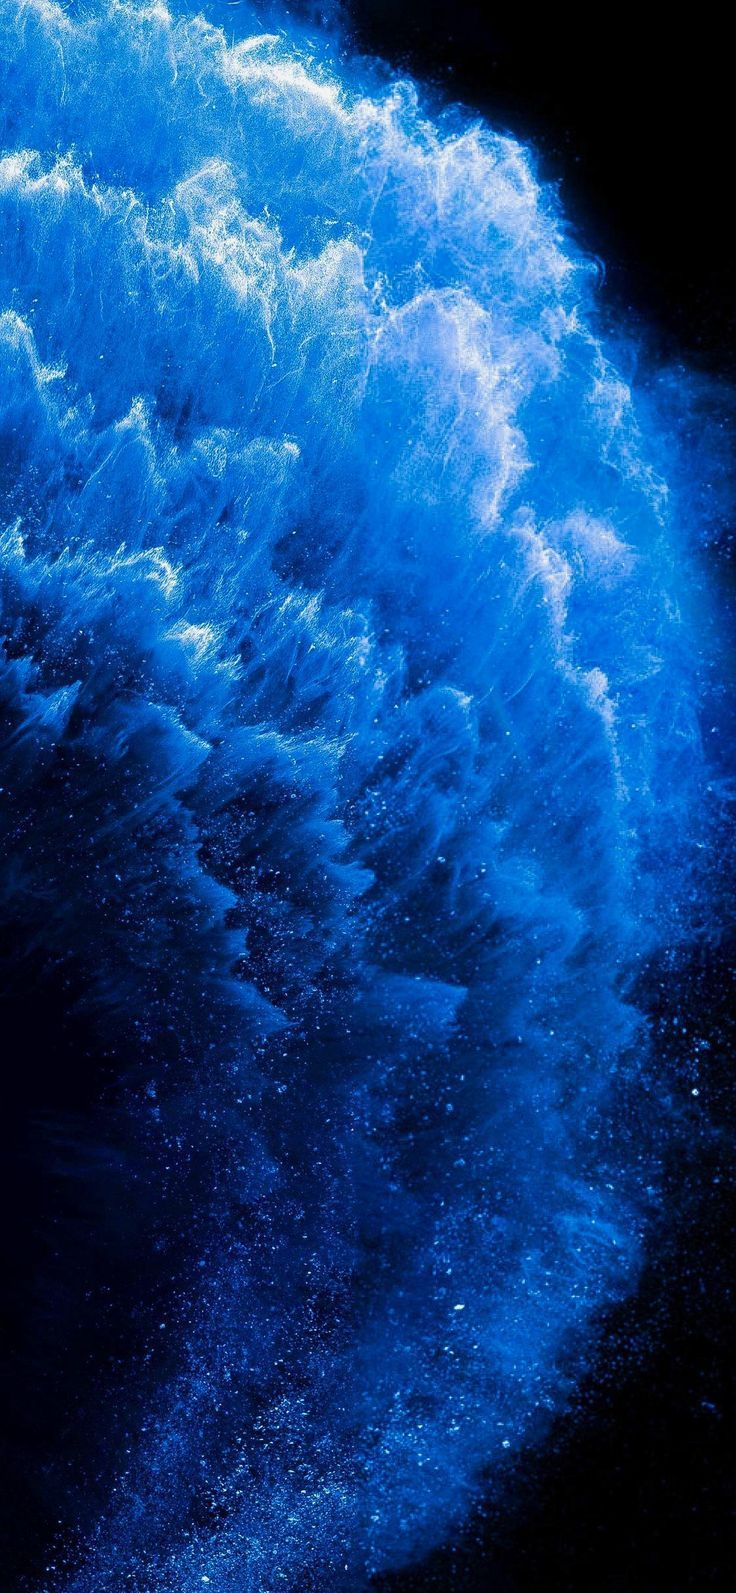 Ios 13 Iphone 11 11 Pro Xr Xs Max Blue Water Stock Dark Clean Simple 4k